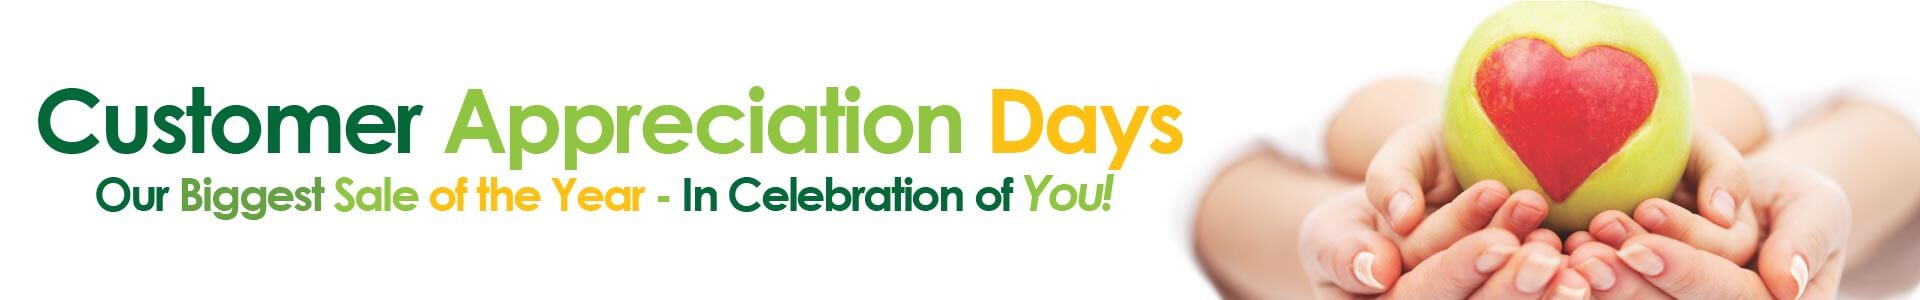 0-2015-CUSTOMER-APPRECIATION-DAY-static-banner